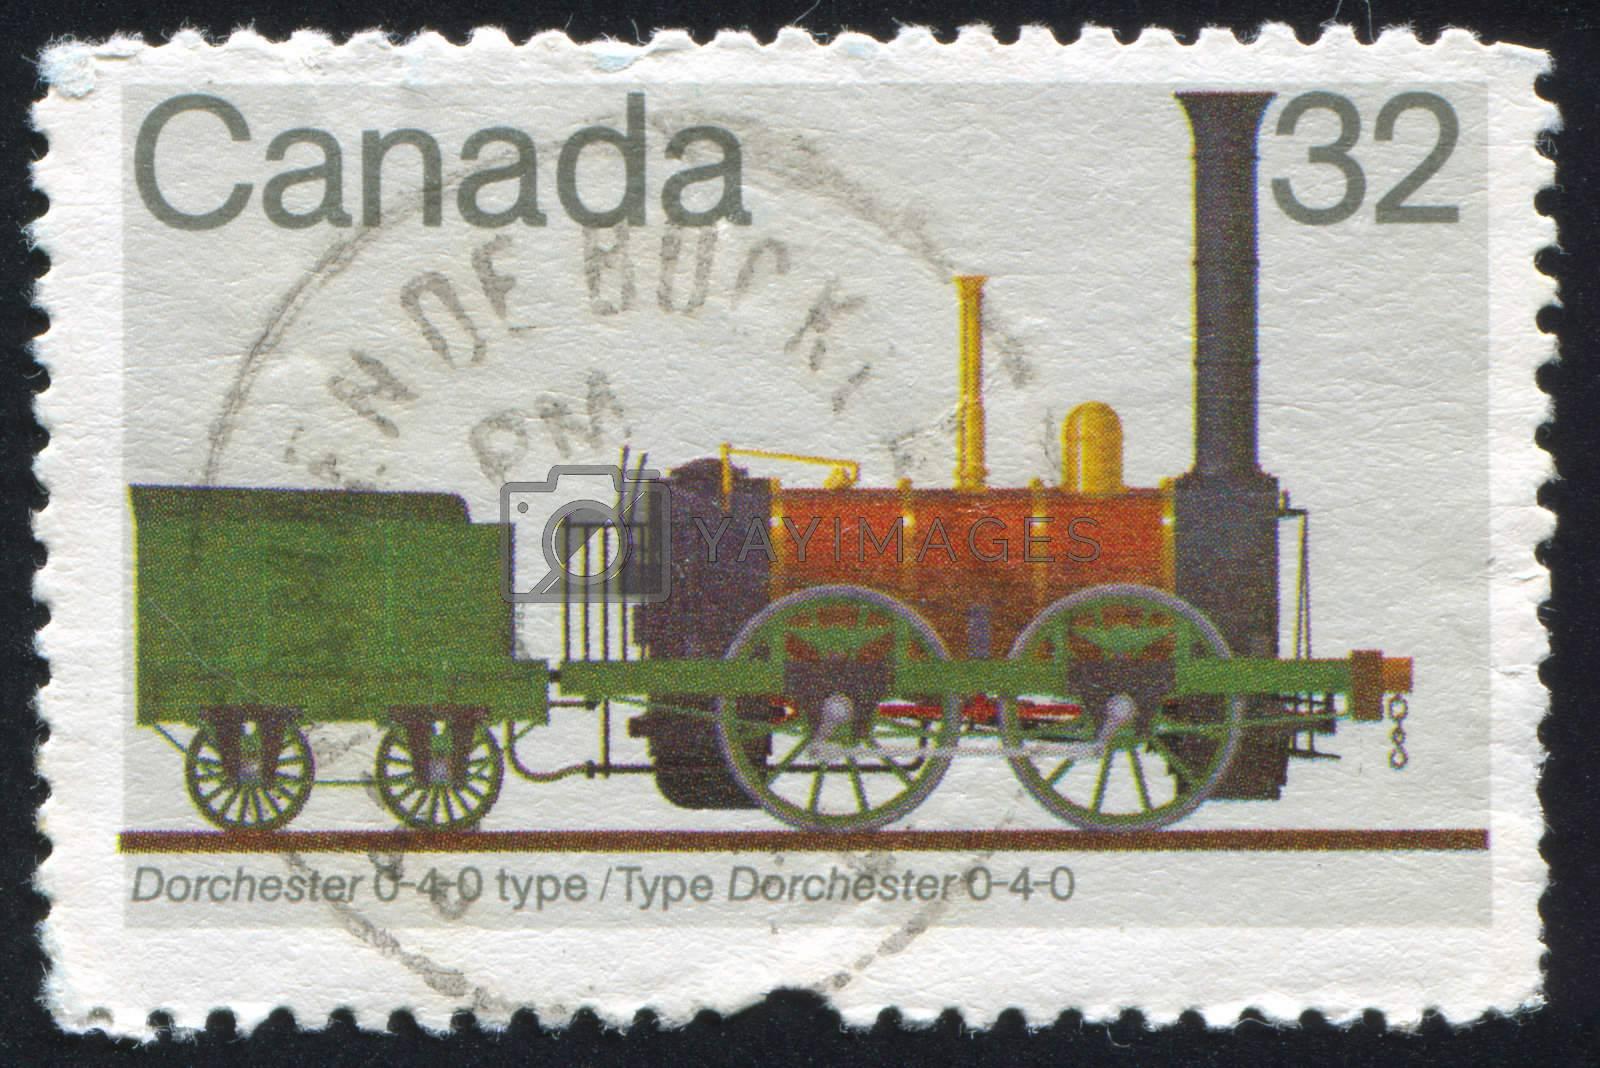 CANADA - CIRCA 1983: stamp printed by Canada, shows locomotive, circa 1983